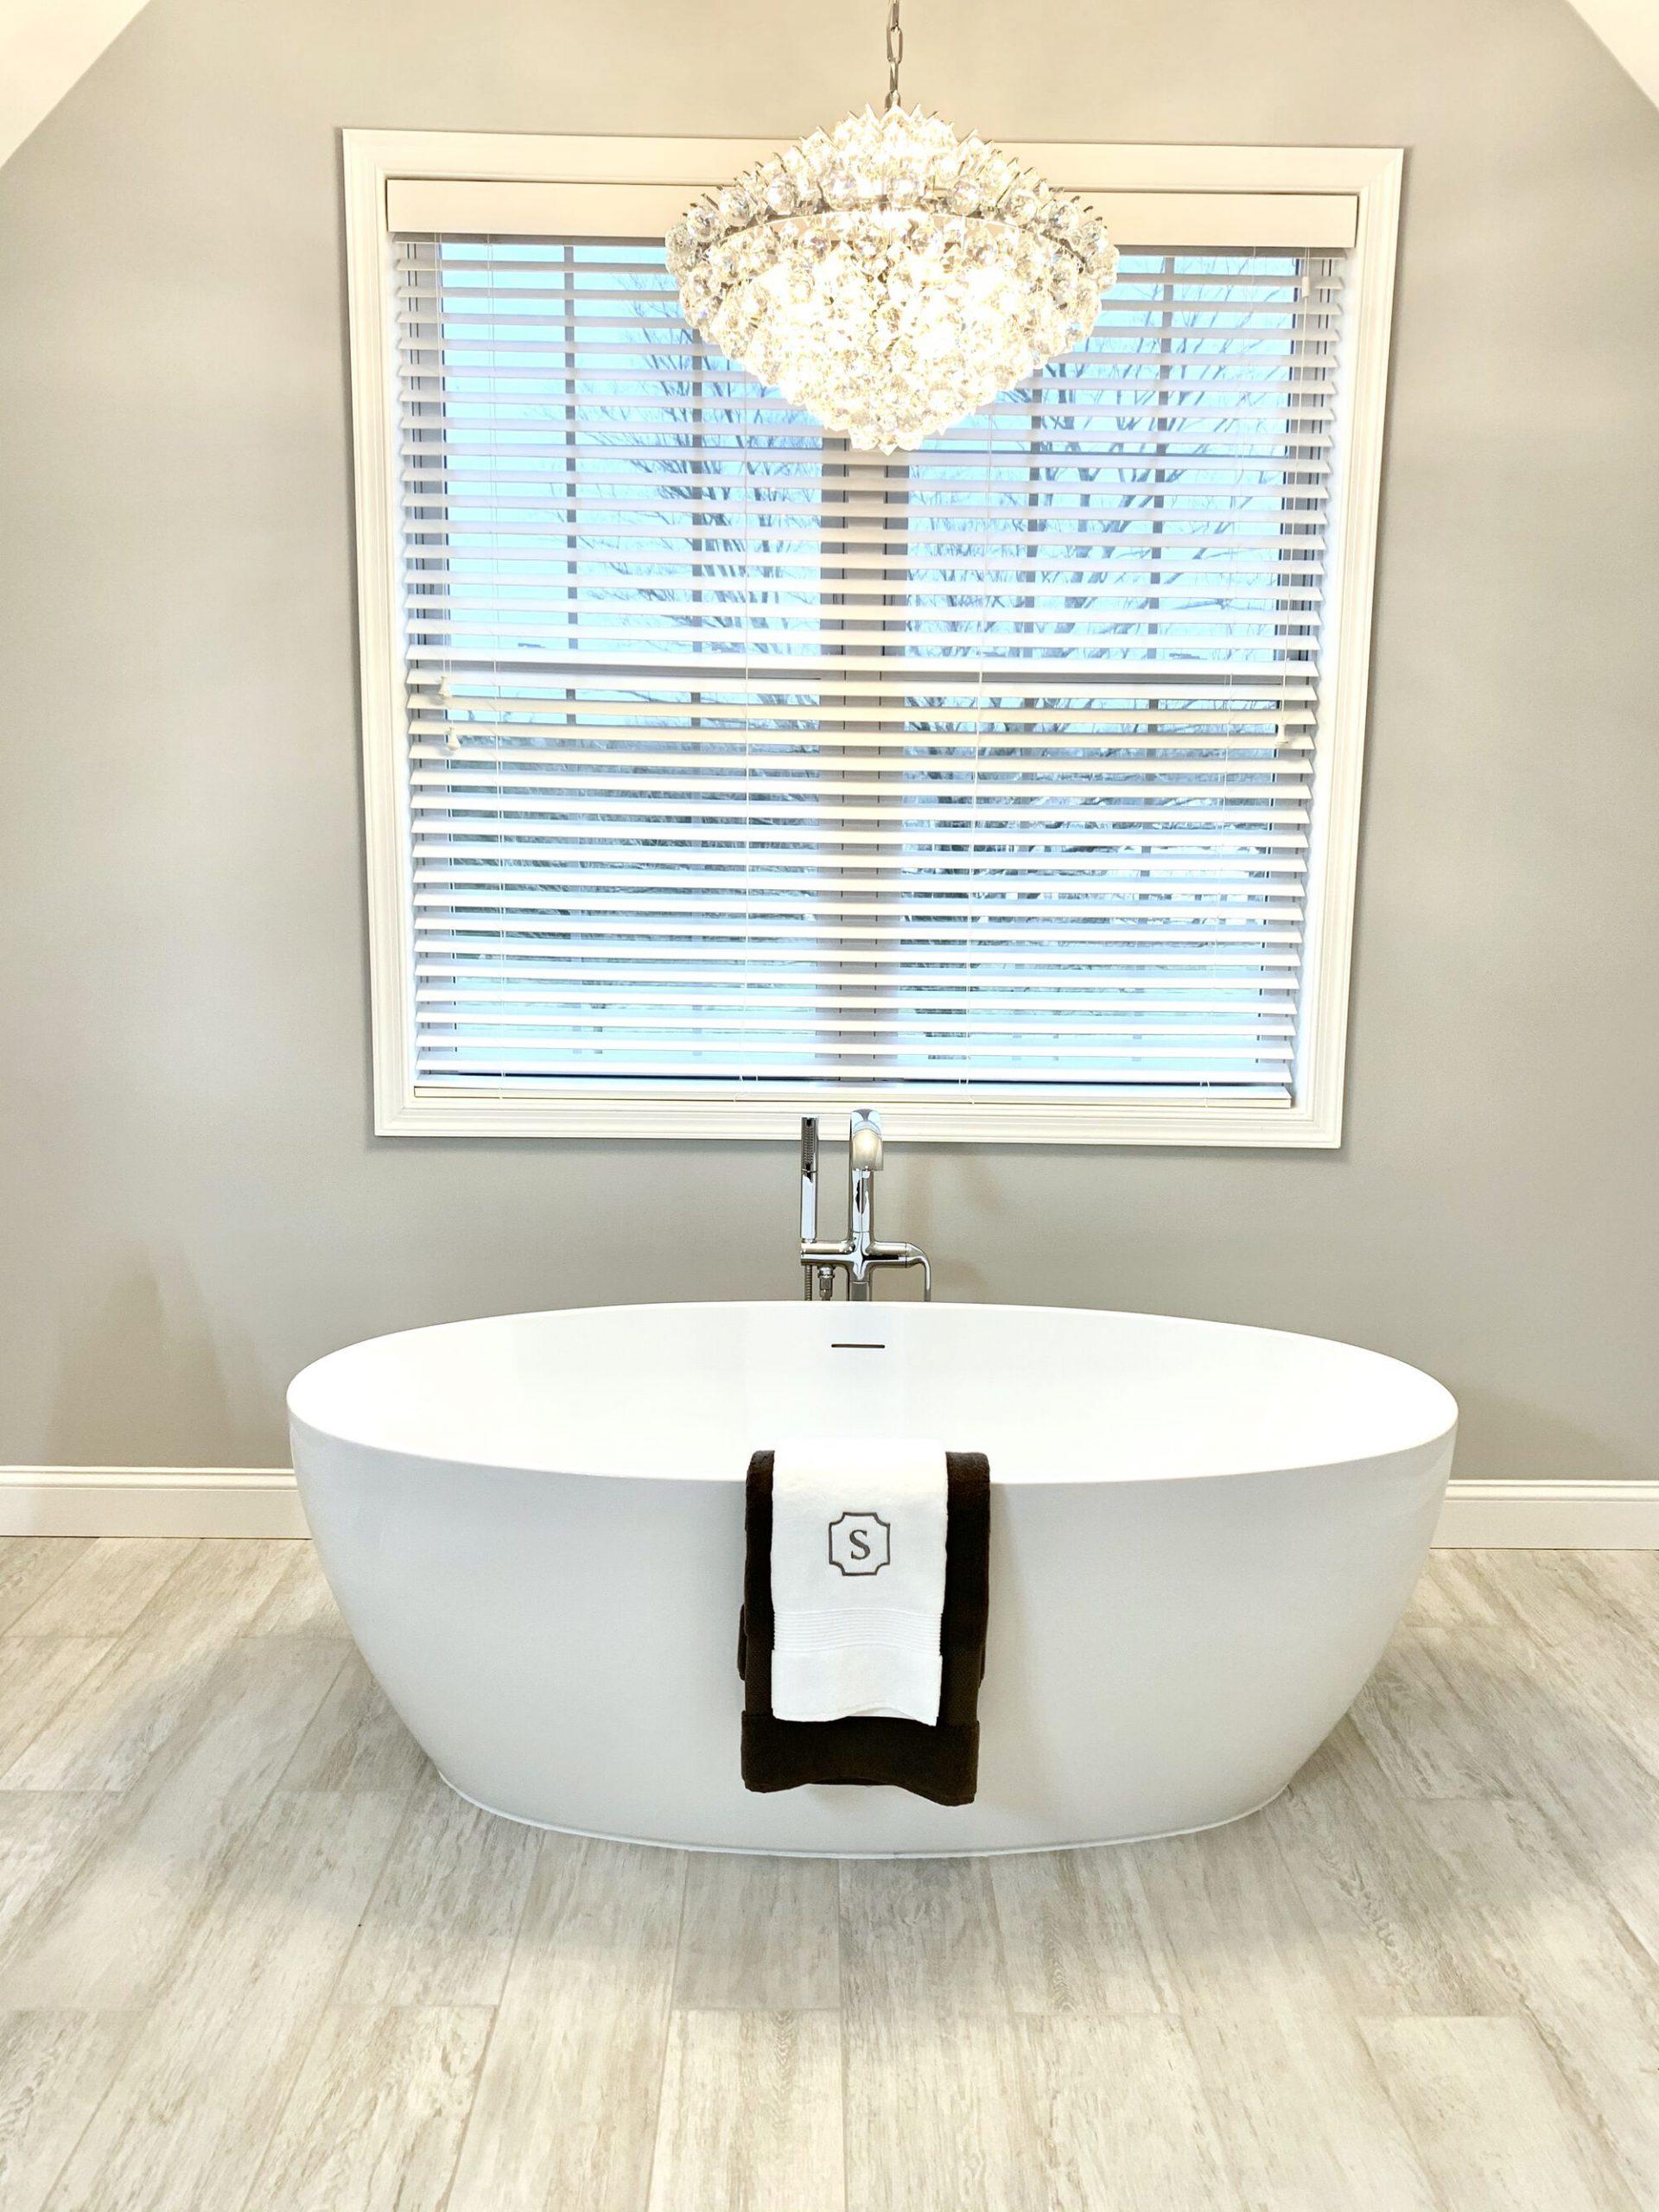 Sparta, Sussex County NJ Master Bath with Fleurco Tub and Kohler Kallista Floor Mounted Tub Filler